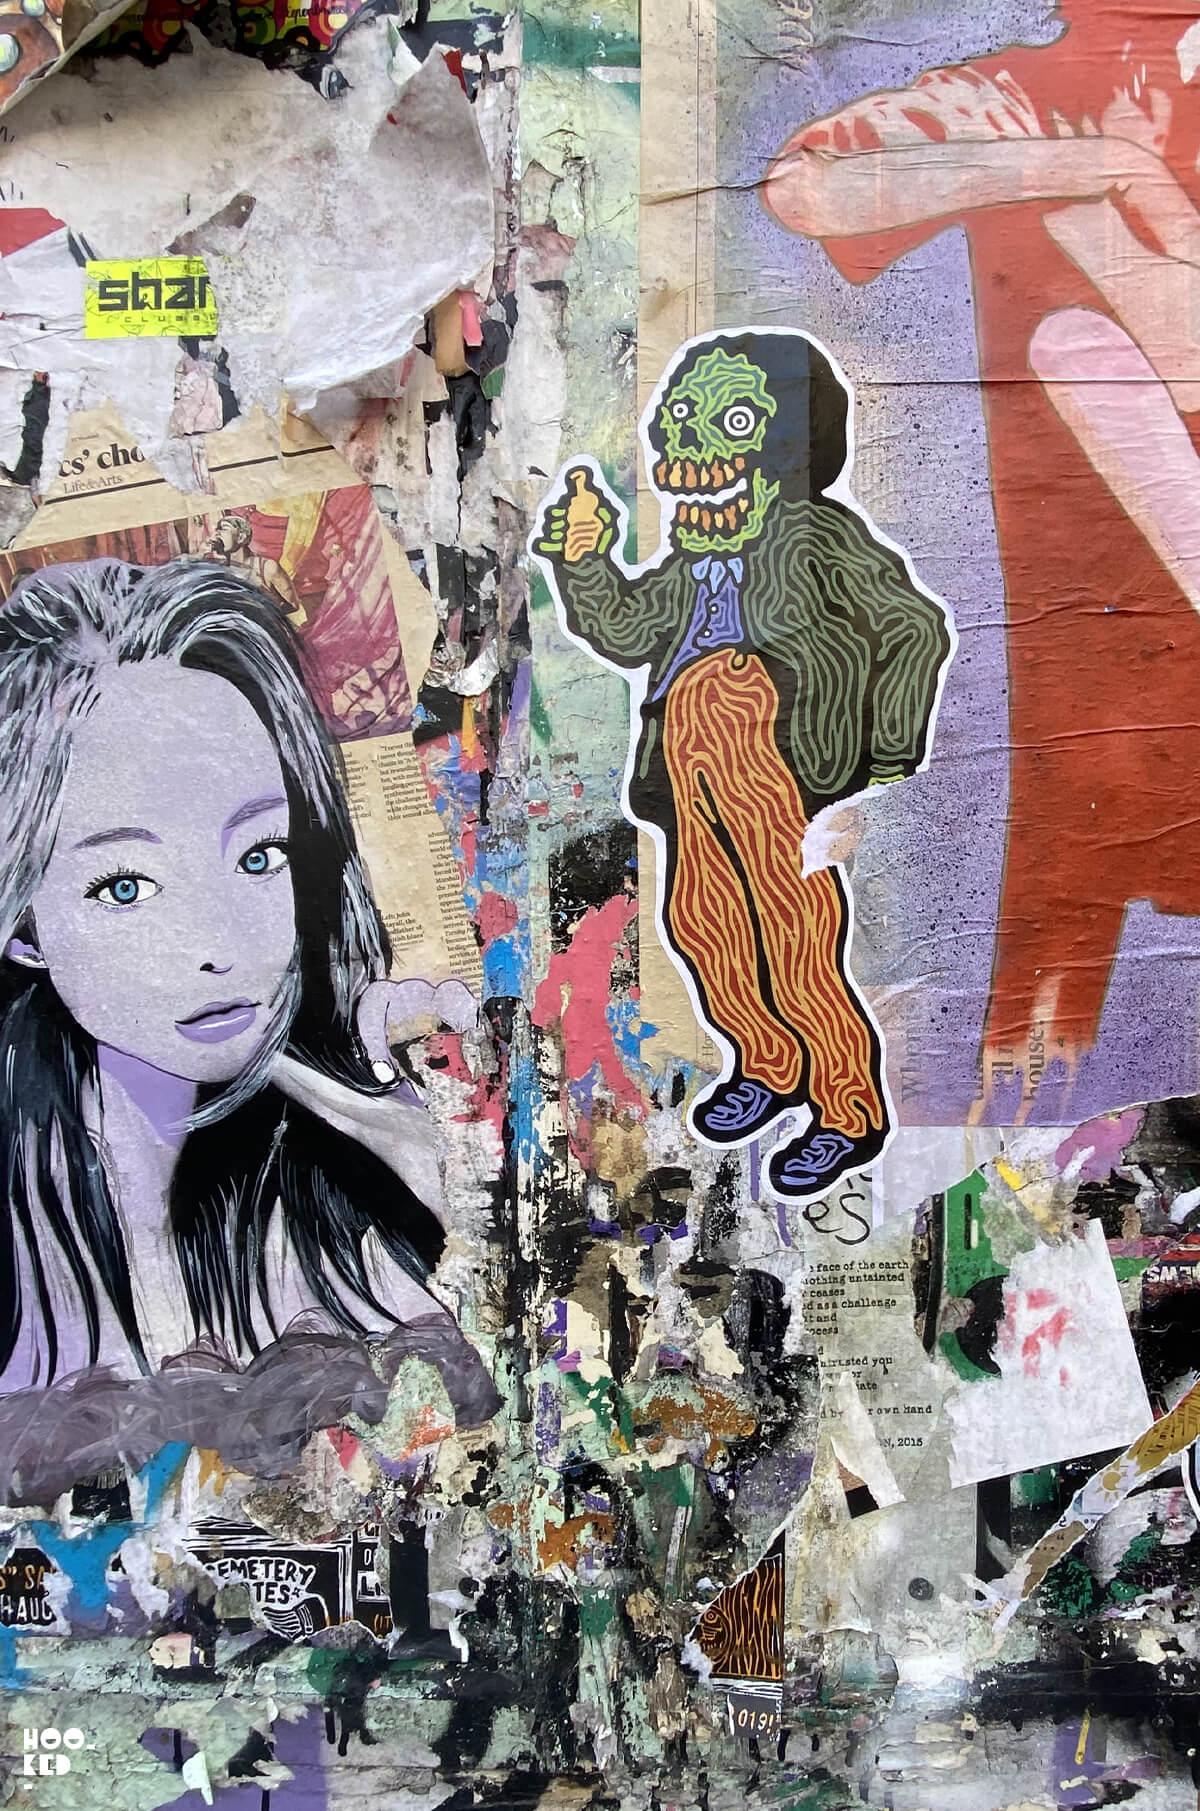 Street Art Paste-ups in London by Rx Skulls, Seven Star Yard